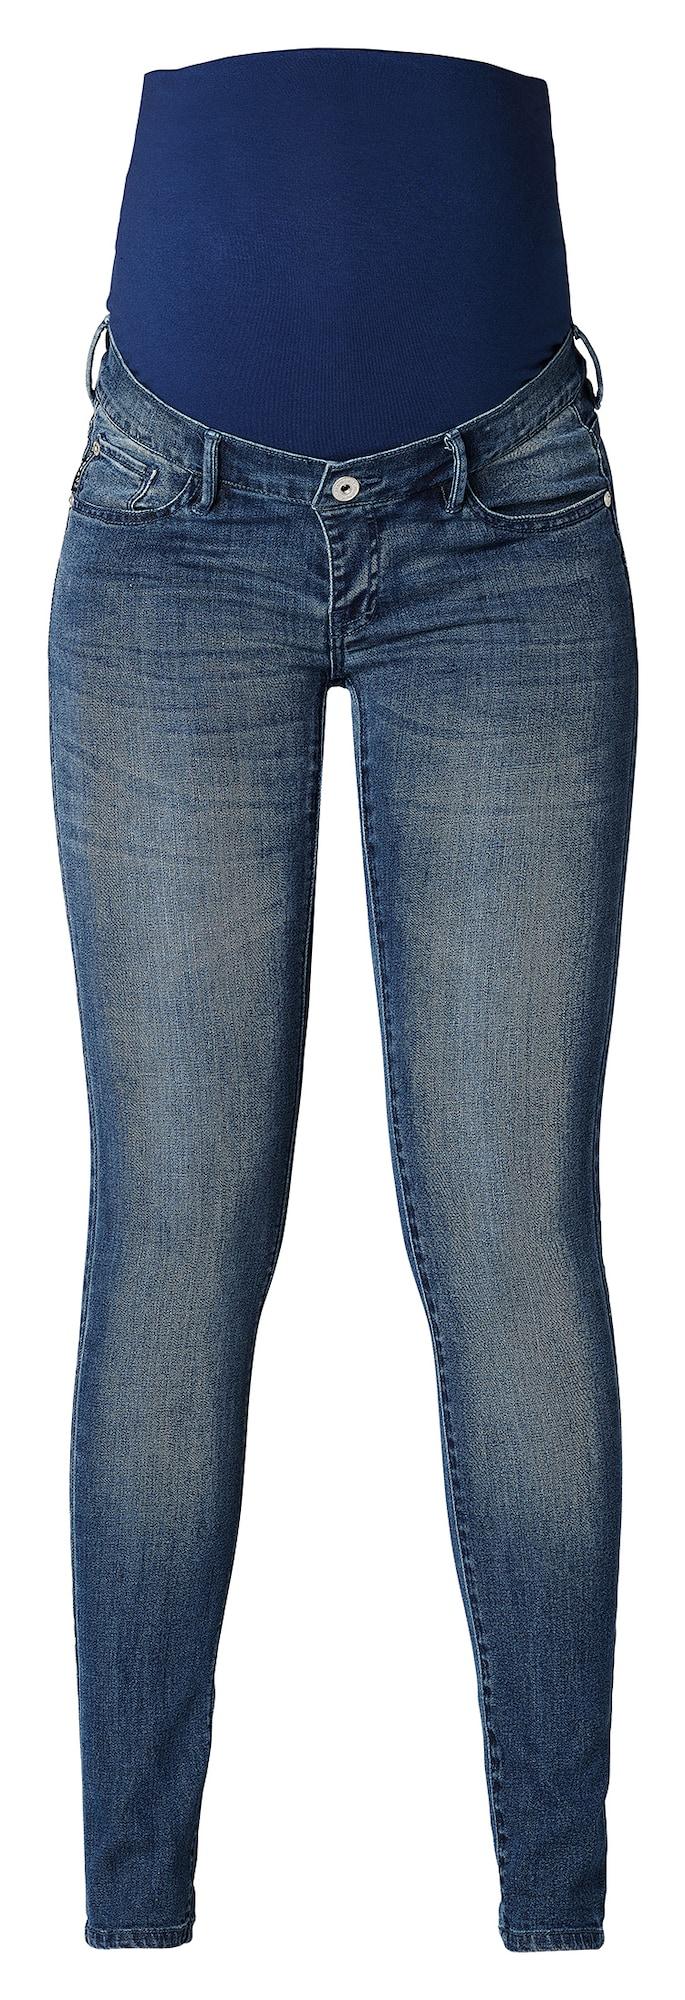 Supermom Džinsai tamsiai (džinso) mėlyna